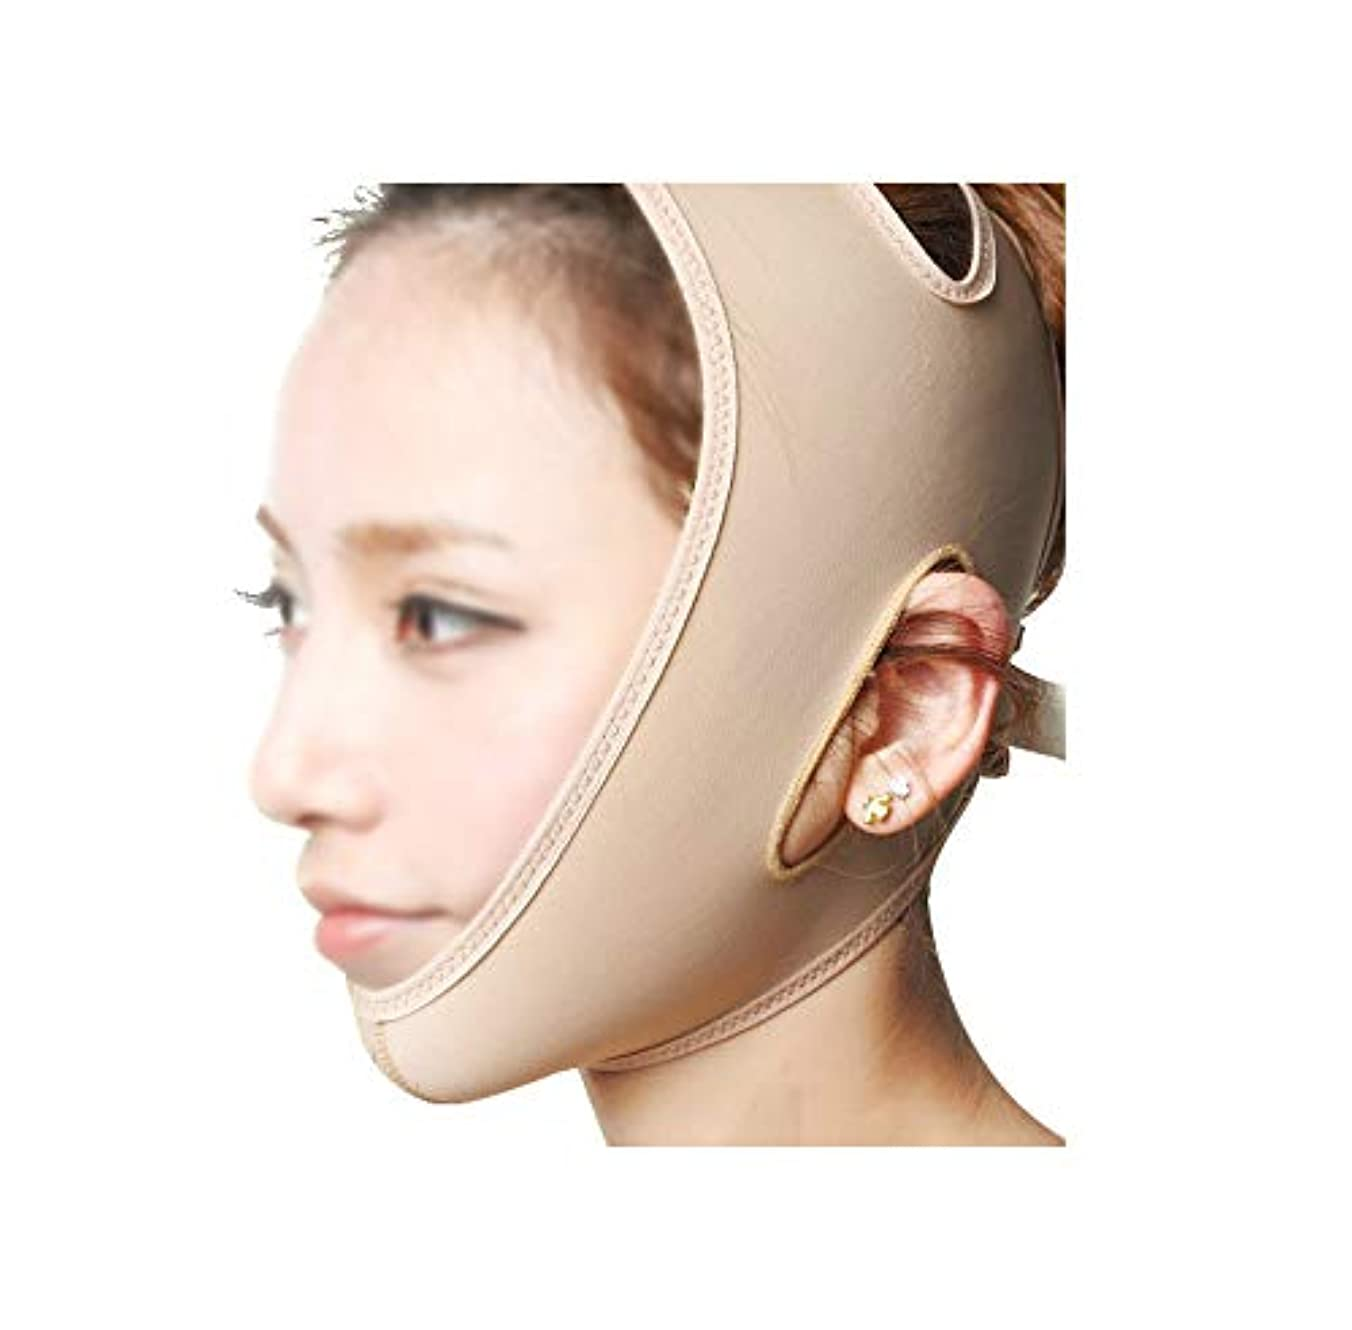 XHLMRMJ フェイスリフティングバンデージ、フェイスマスク3Dパネルデザイン、通気性のある非通気性、高弾性ライクラ生地フィジカルVフェイス、美しい顔の輪郭の作成 (Size : M)